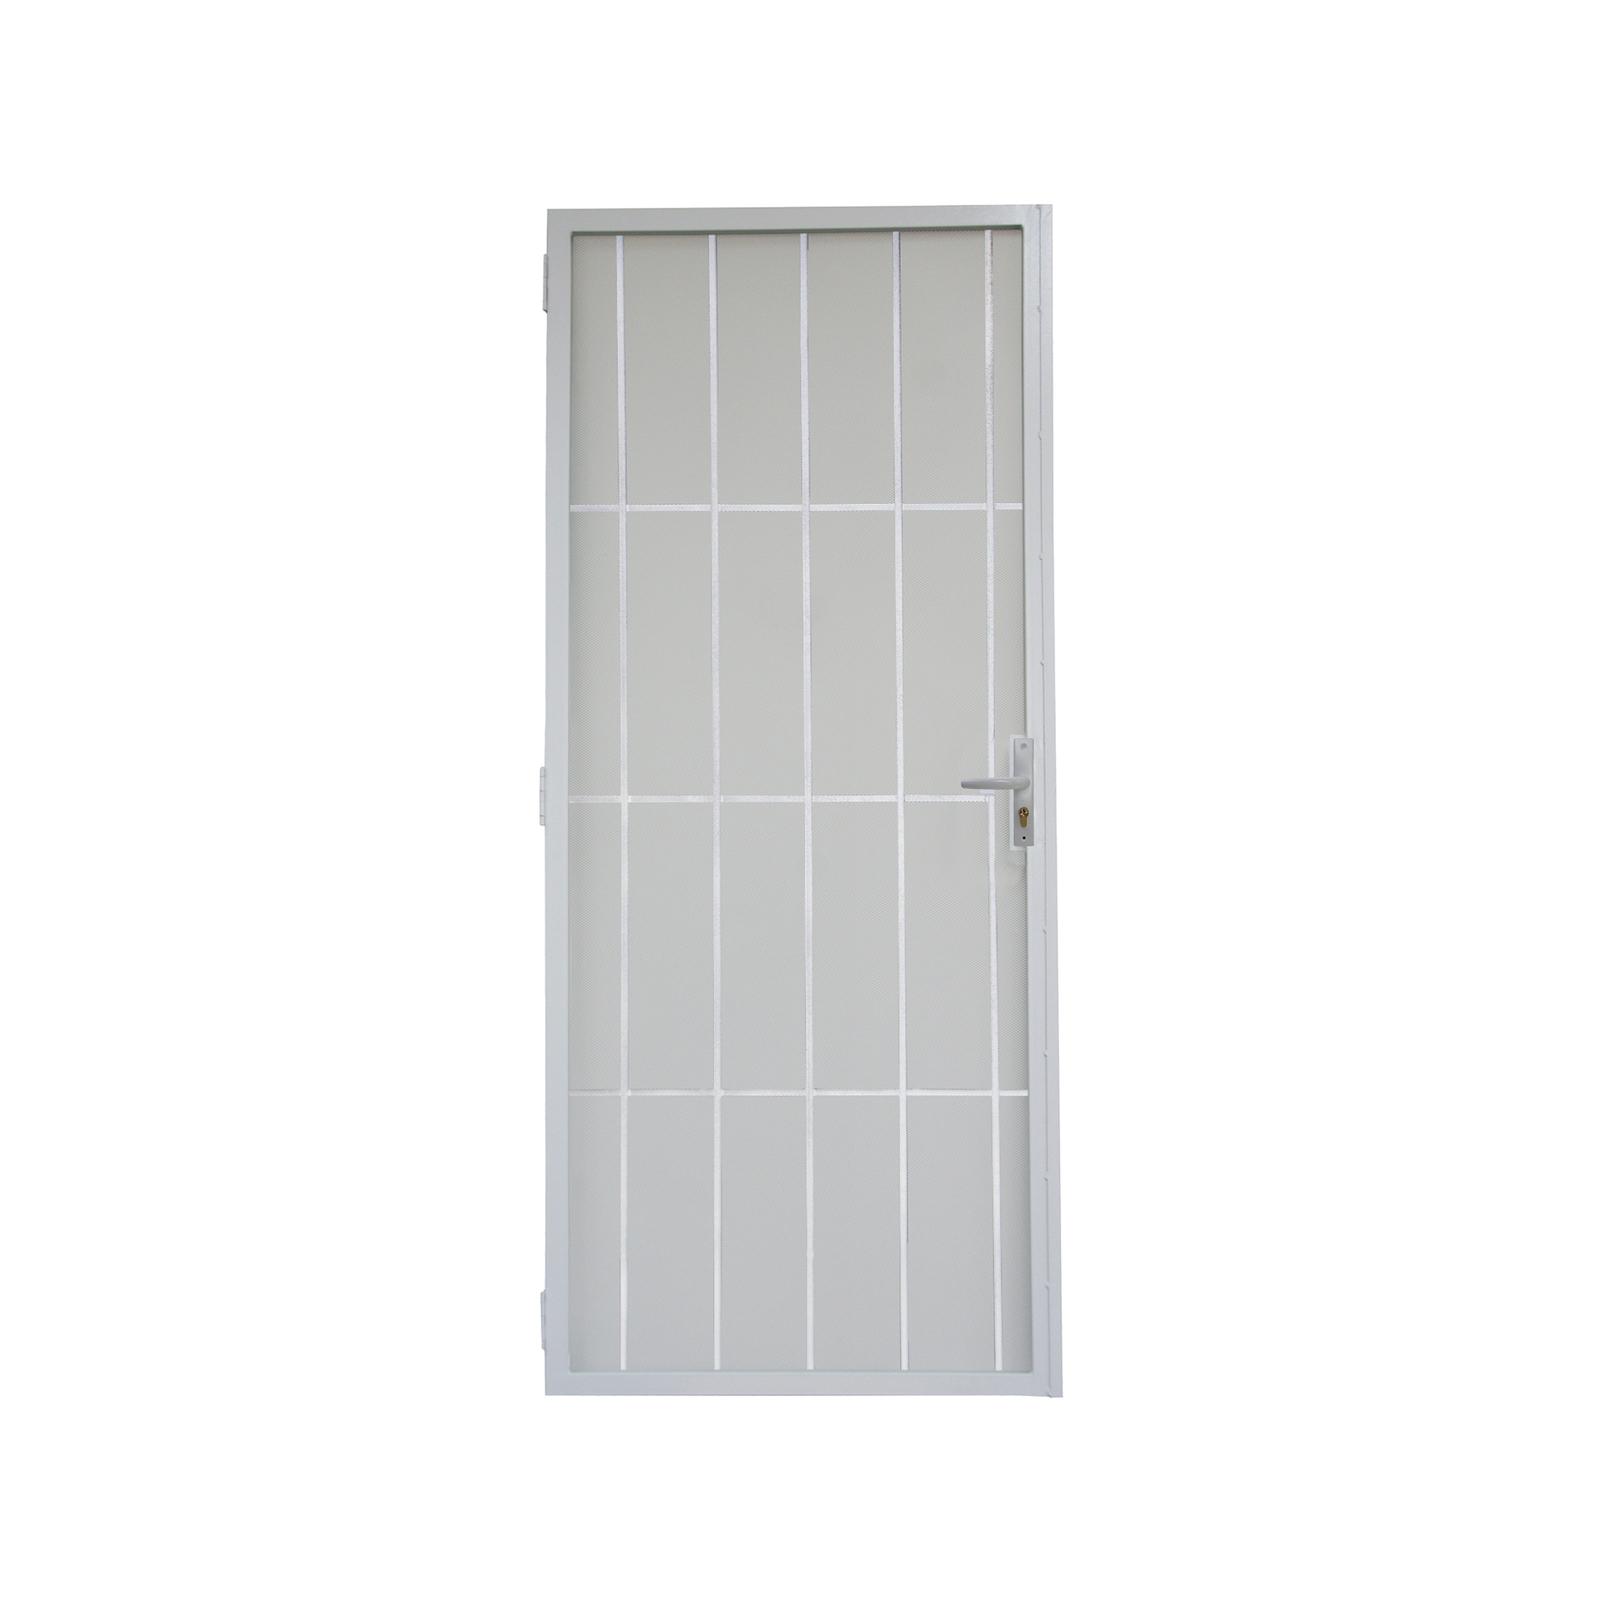 Pillar 2032 x 813mm White Classic Steel Frame Metric Screen Door